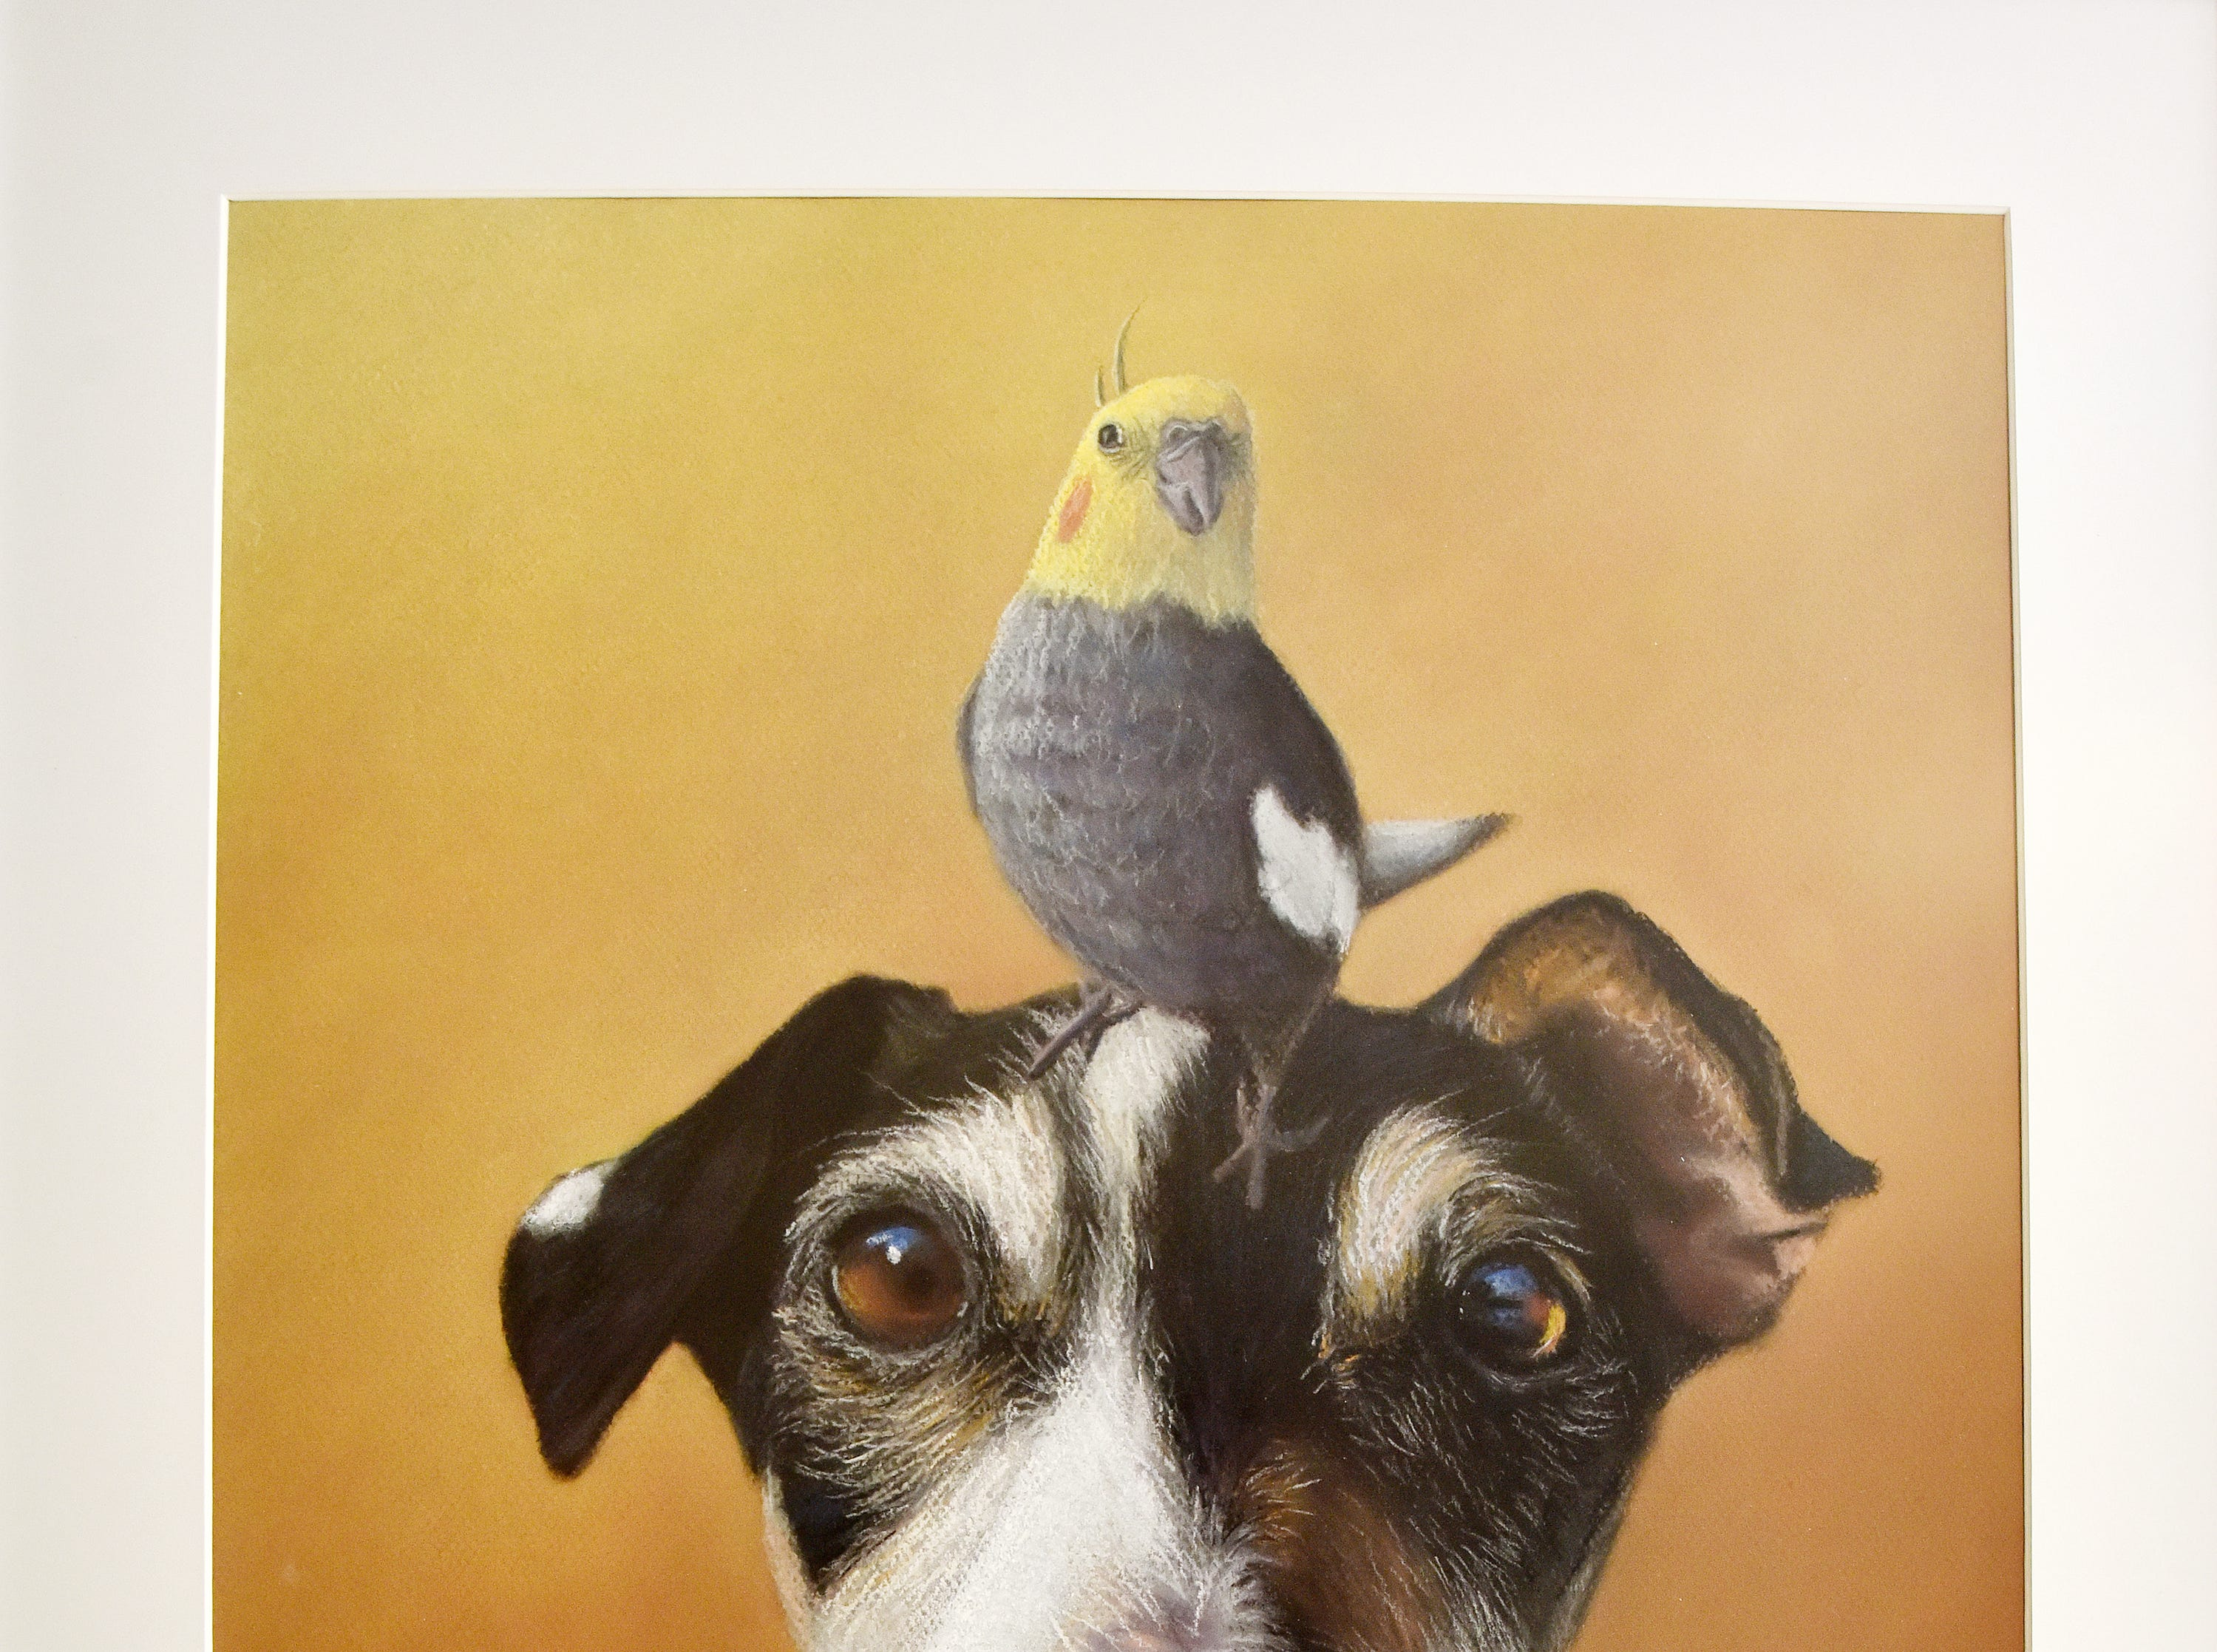 A pet portrait by artist Olivia White.